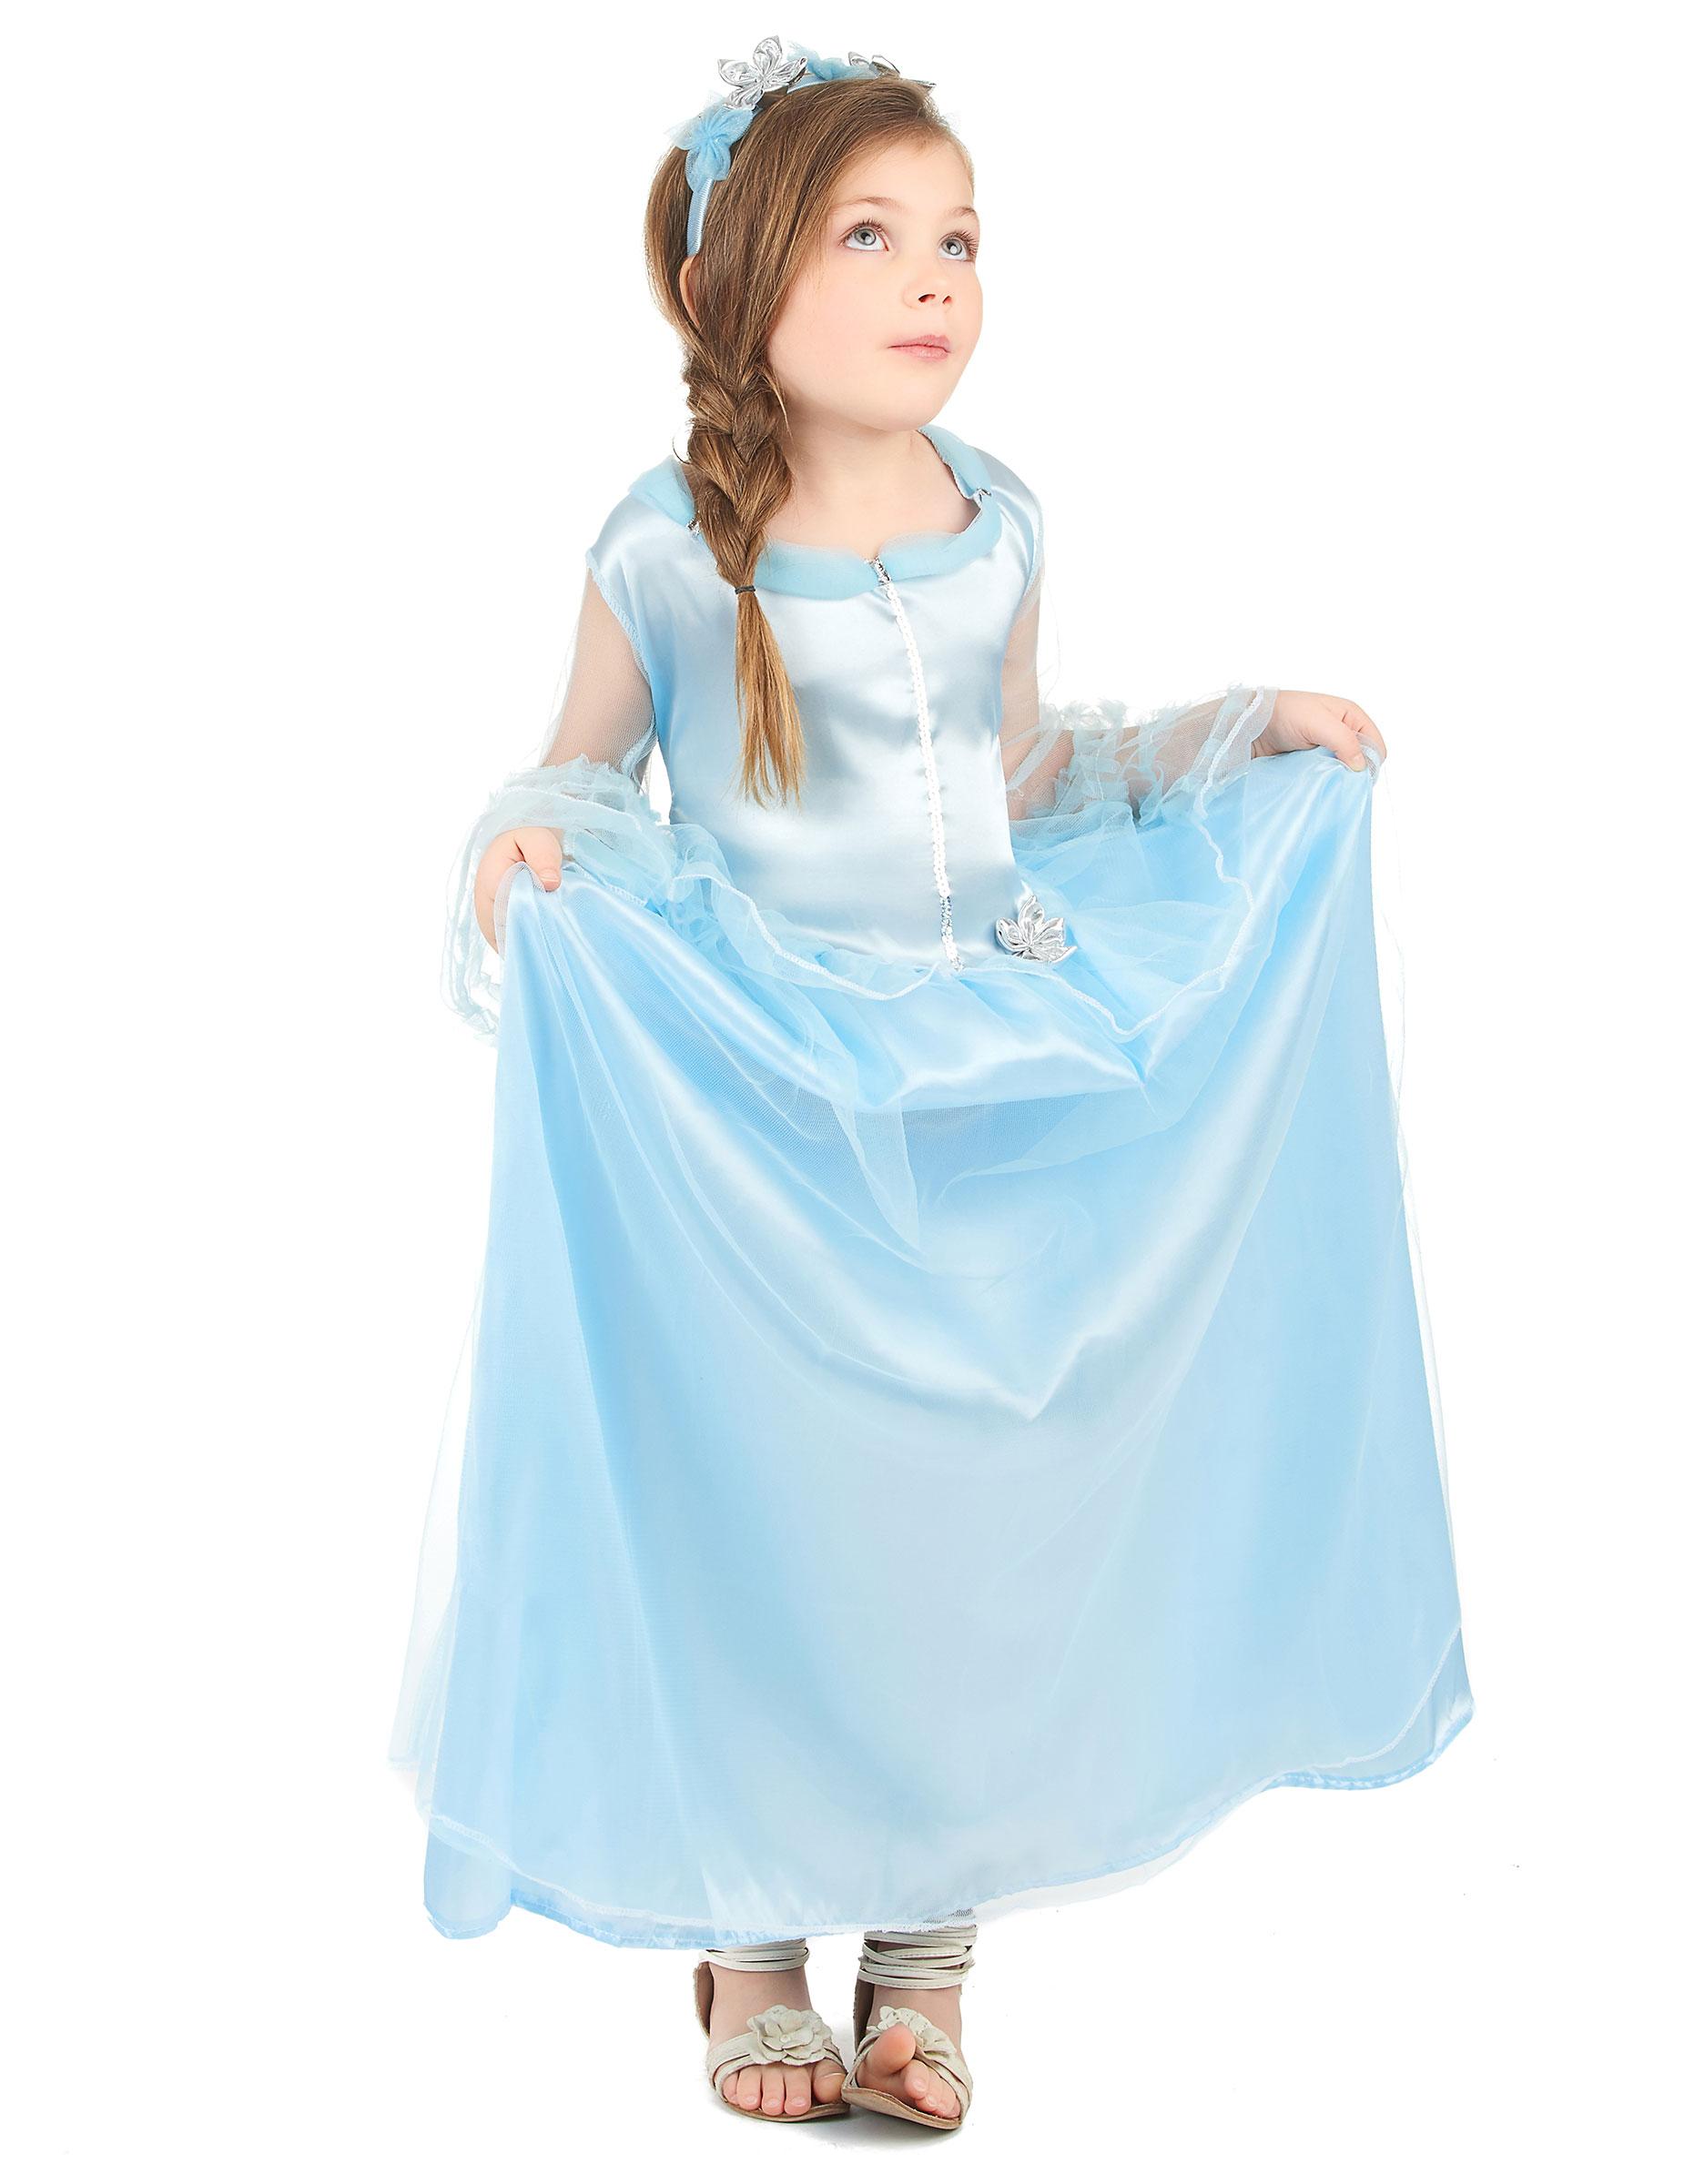 952ed8ba5a17 Costume da principessa azzurra per bambina